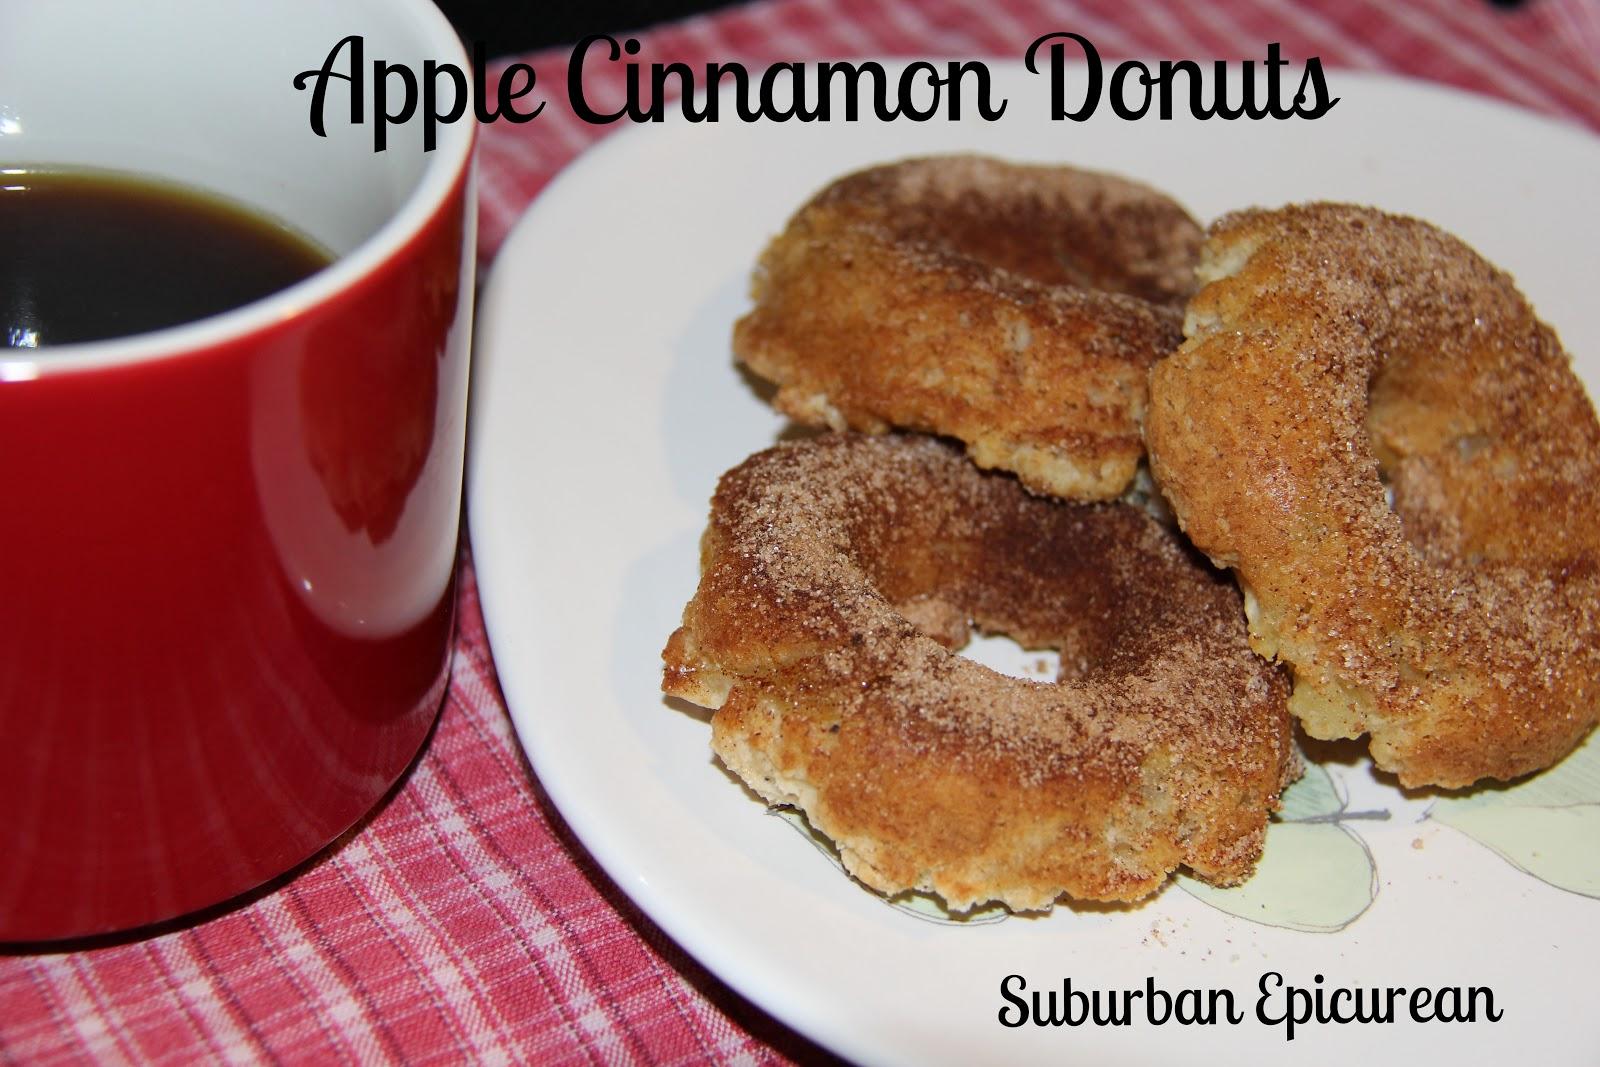 Suburban Epicurean: Baked Apple Cinnamon Donuts